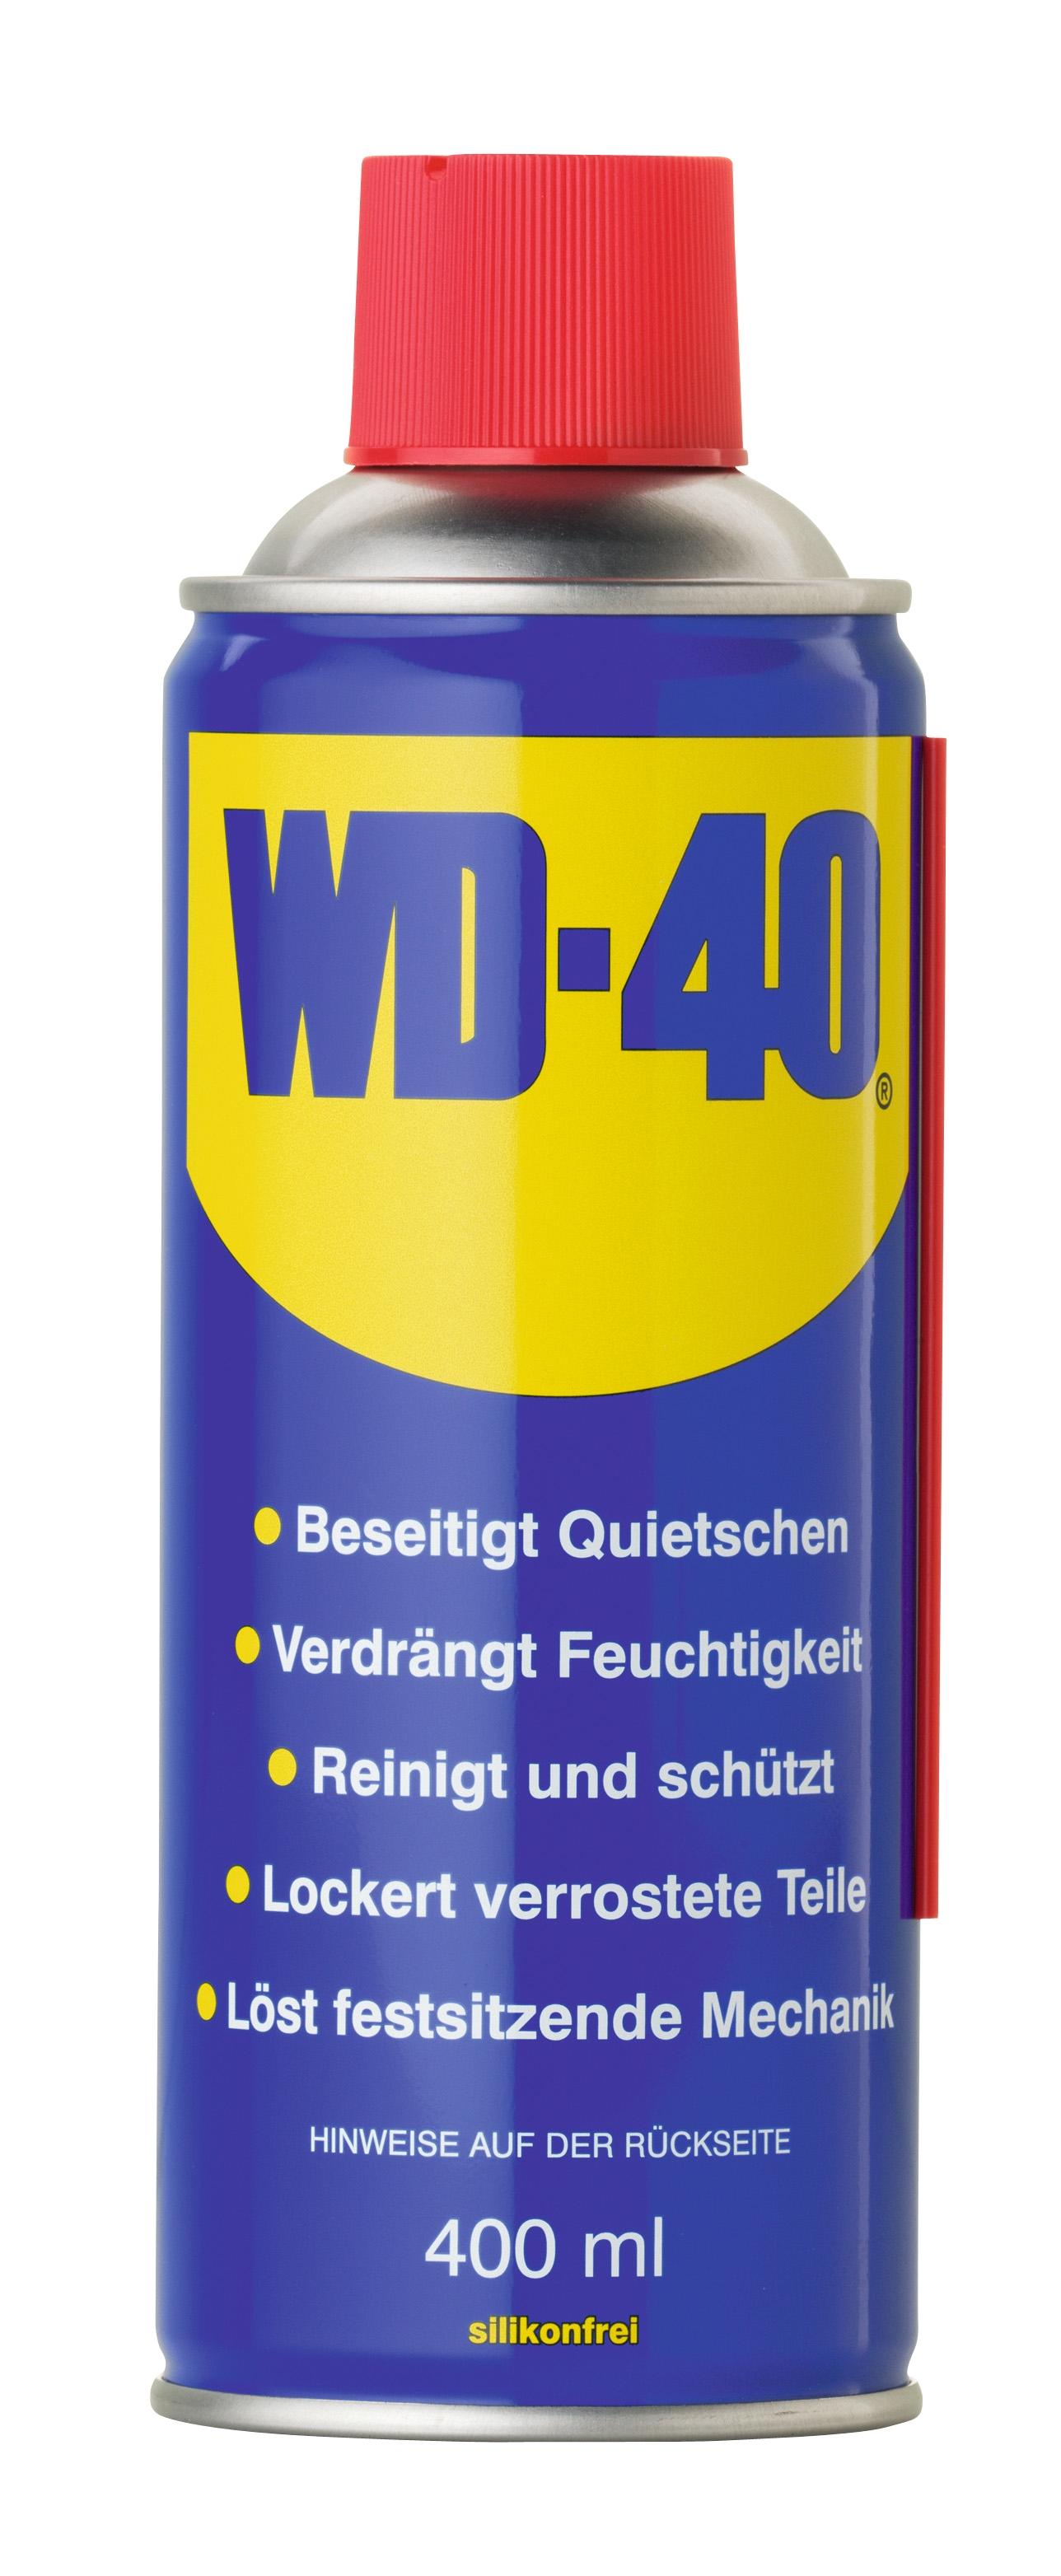 WD-40 Multifunktionele olie spray